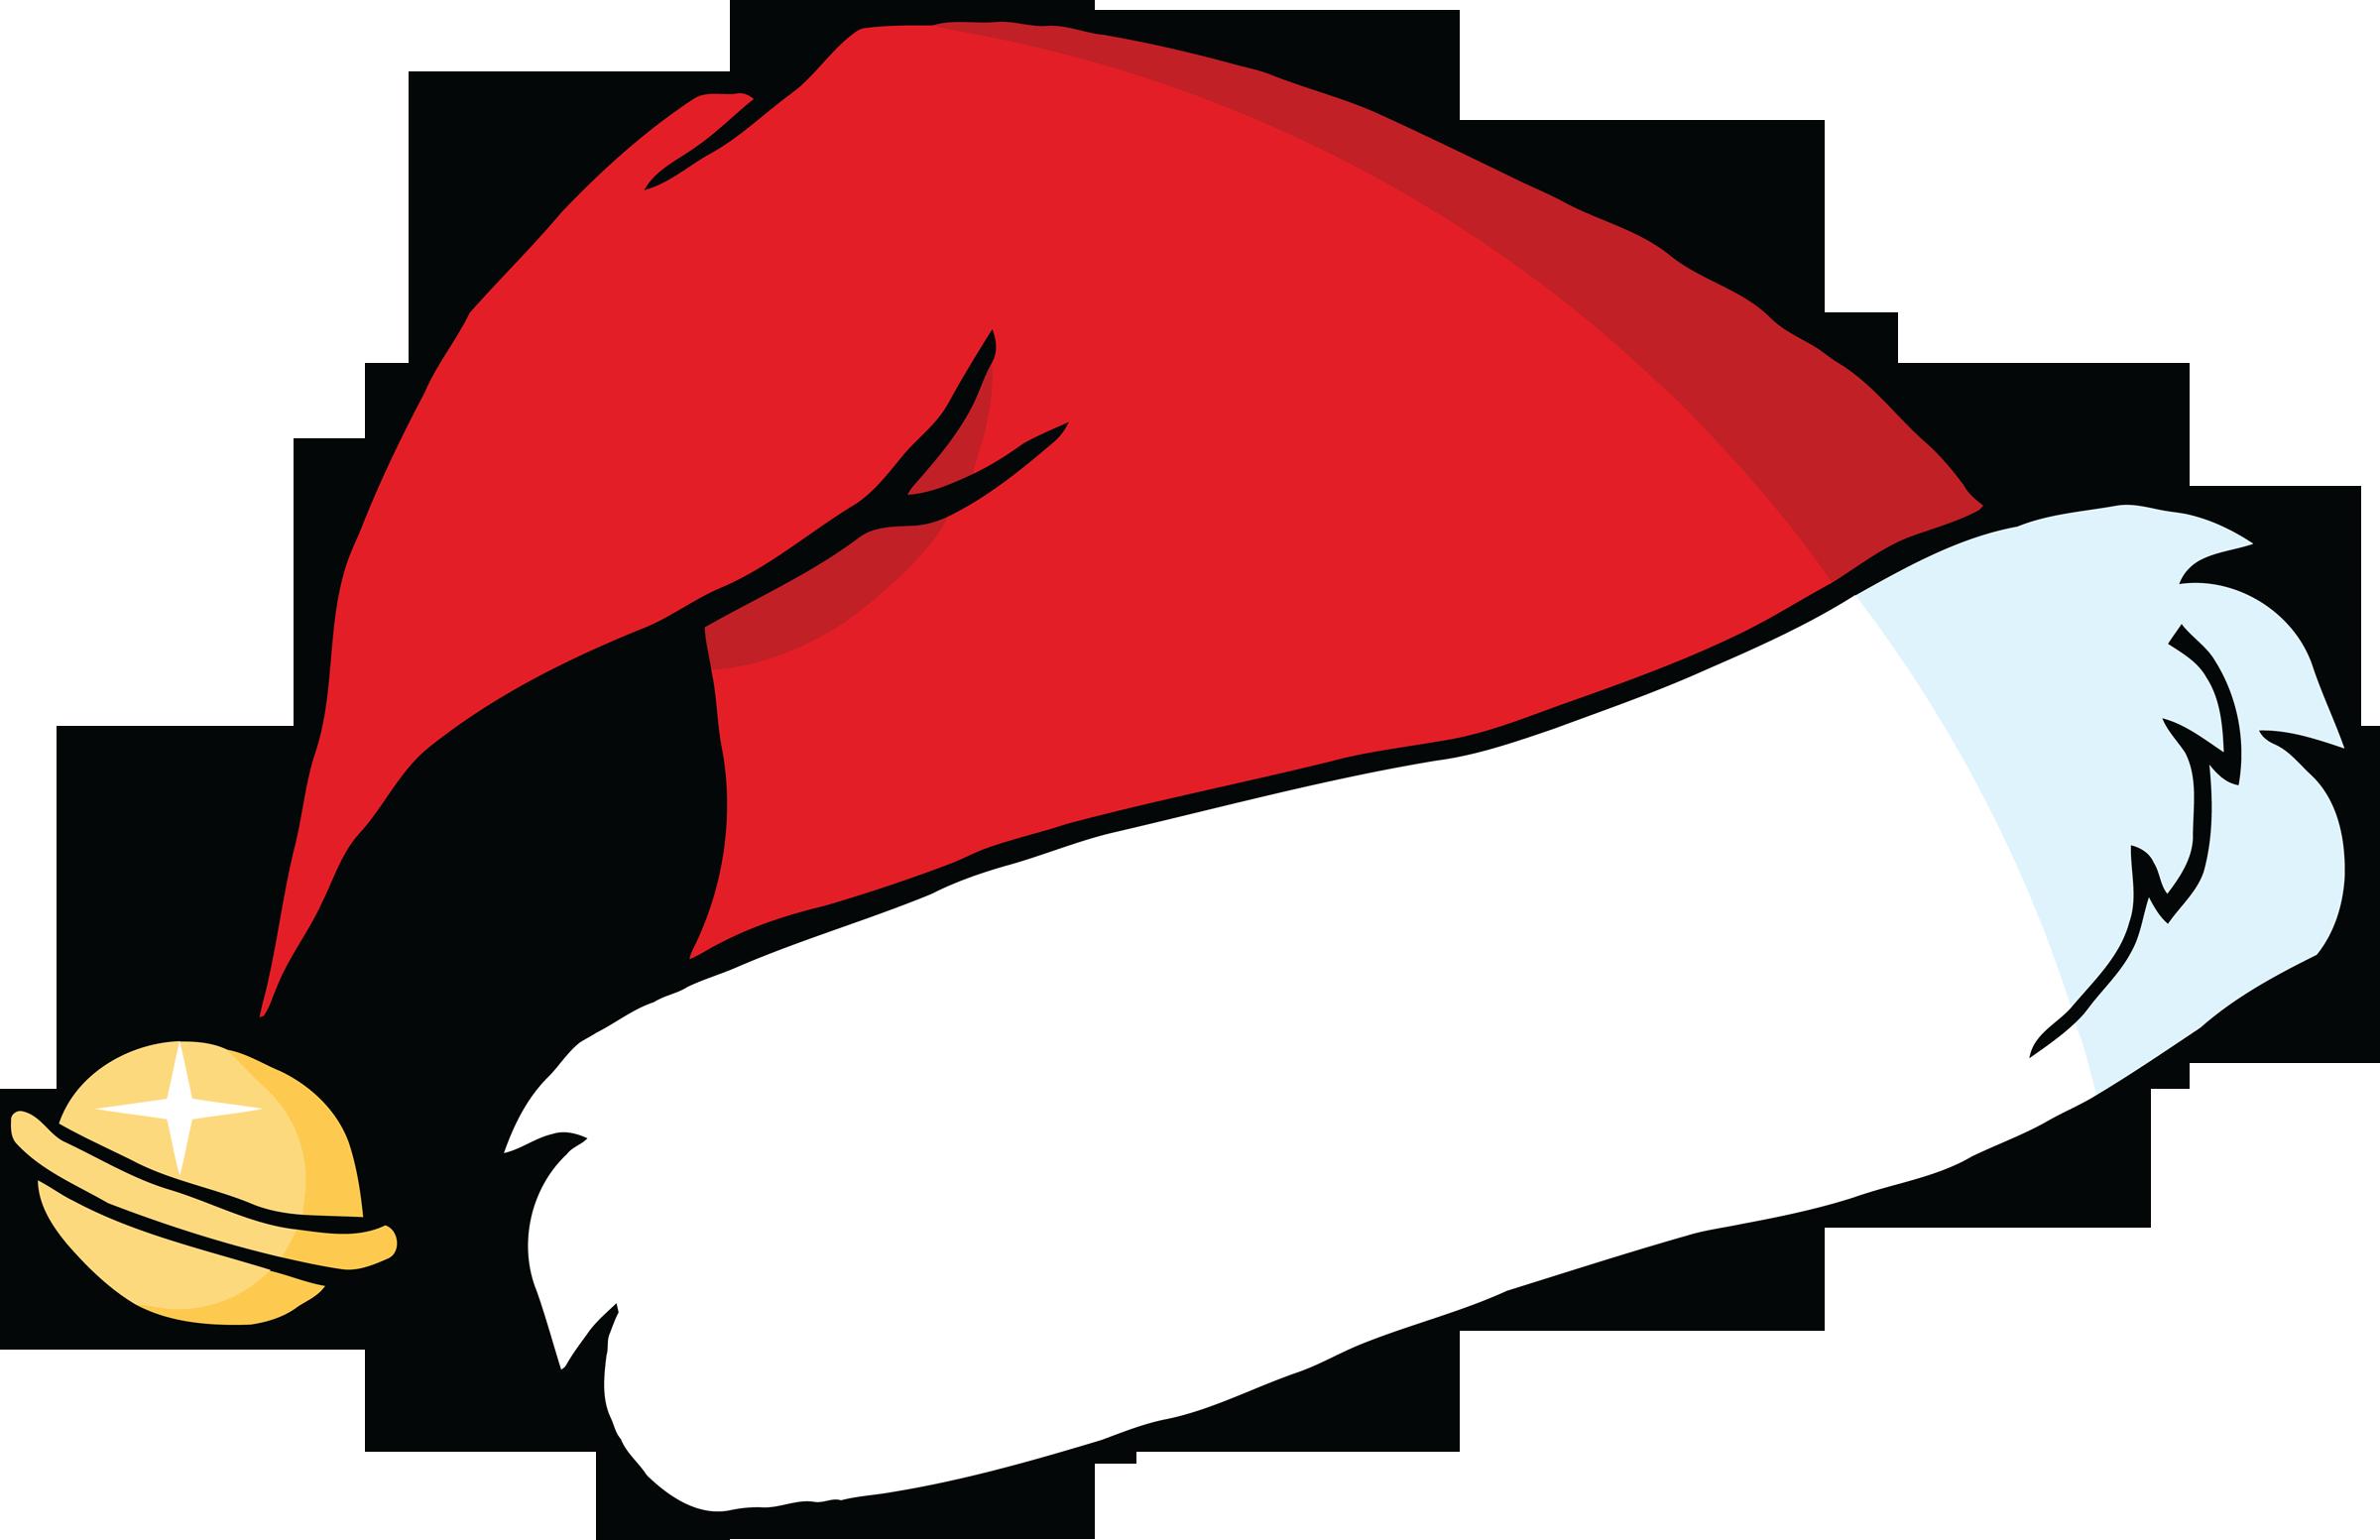 Santa Hat Png Hd Wallpaper And Download Free Wallpaper Hat Template Santa Hat Hat Clips